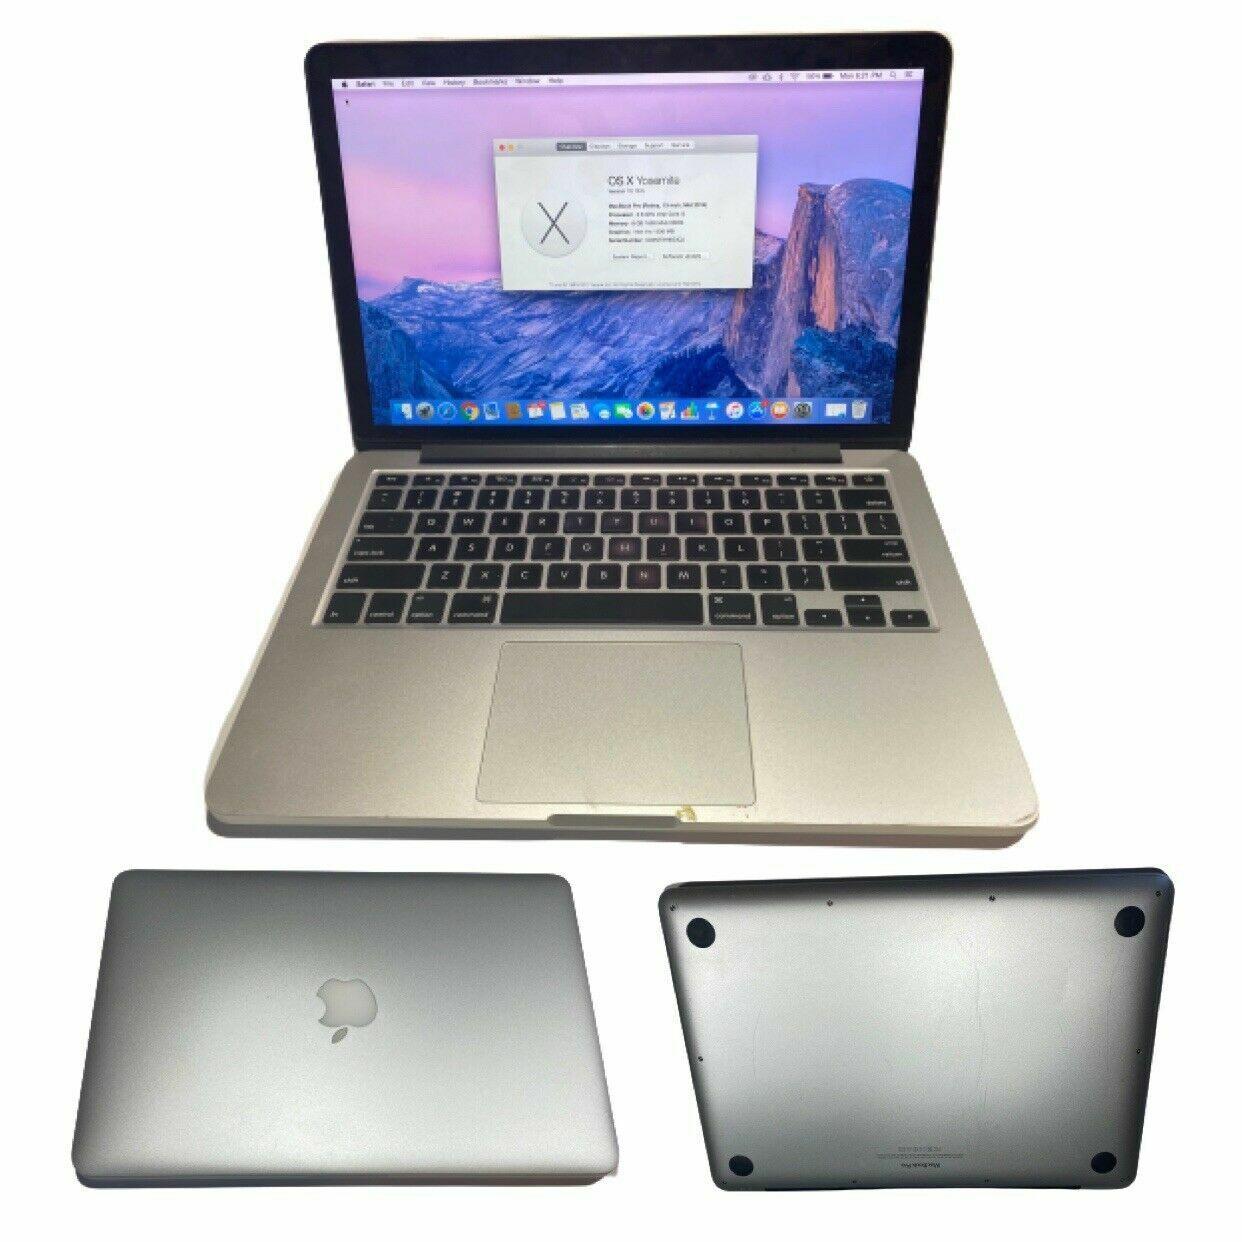 Apple MacBook Pro Retina 13 A1502 Battery Replacement Service - $138.99